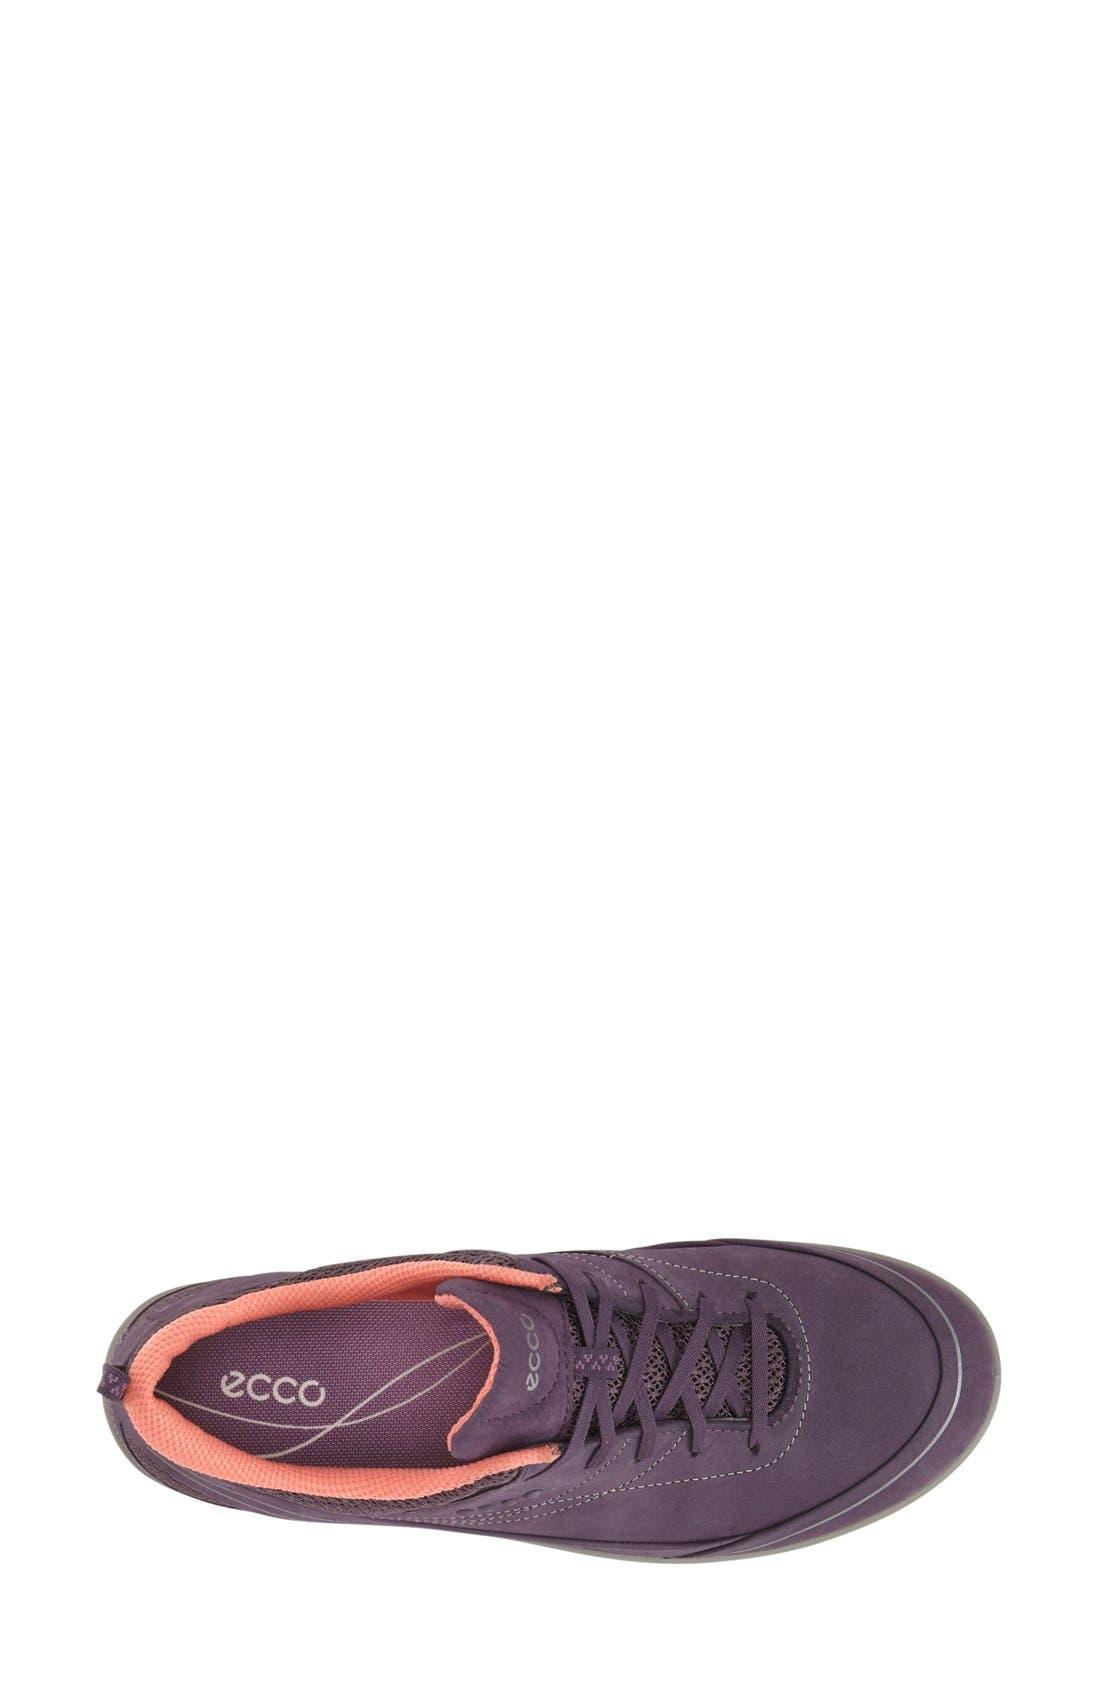 'Arizona' Sneaker,                             Alternate thumbnail 16, color,